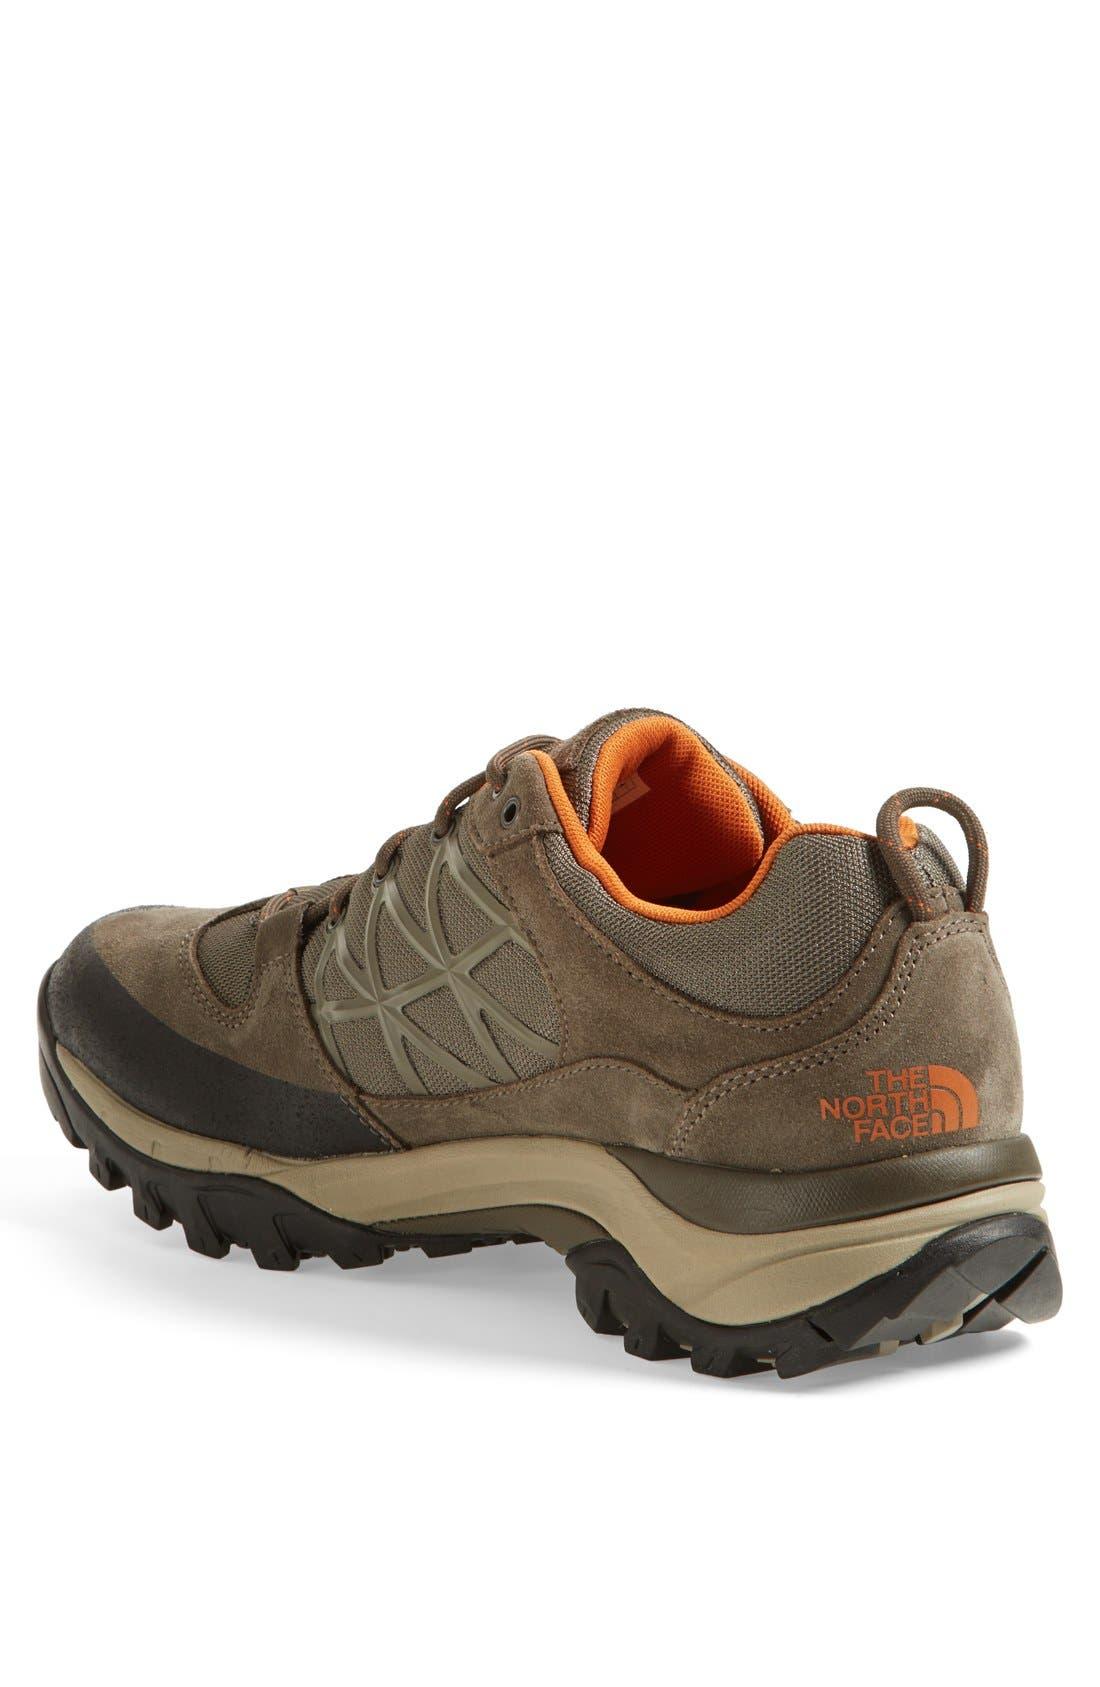 Alternate Image 2  - The North Face 'Storm WP' Hiking Shoe (Men)